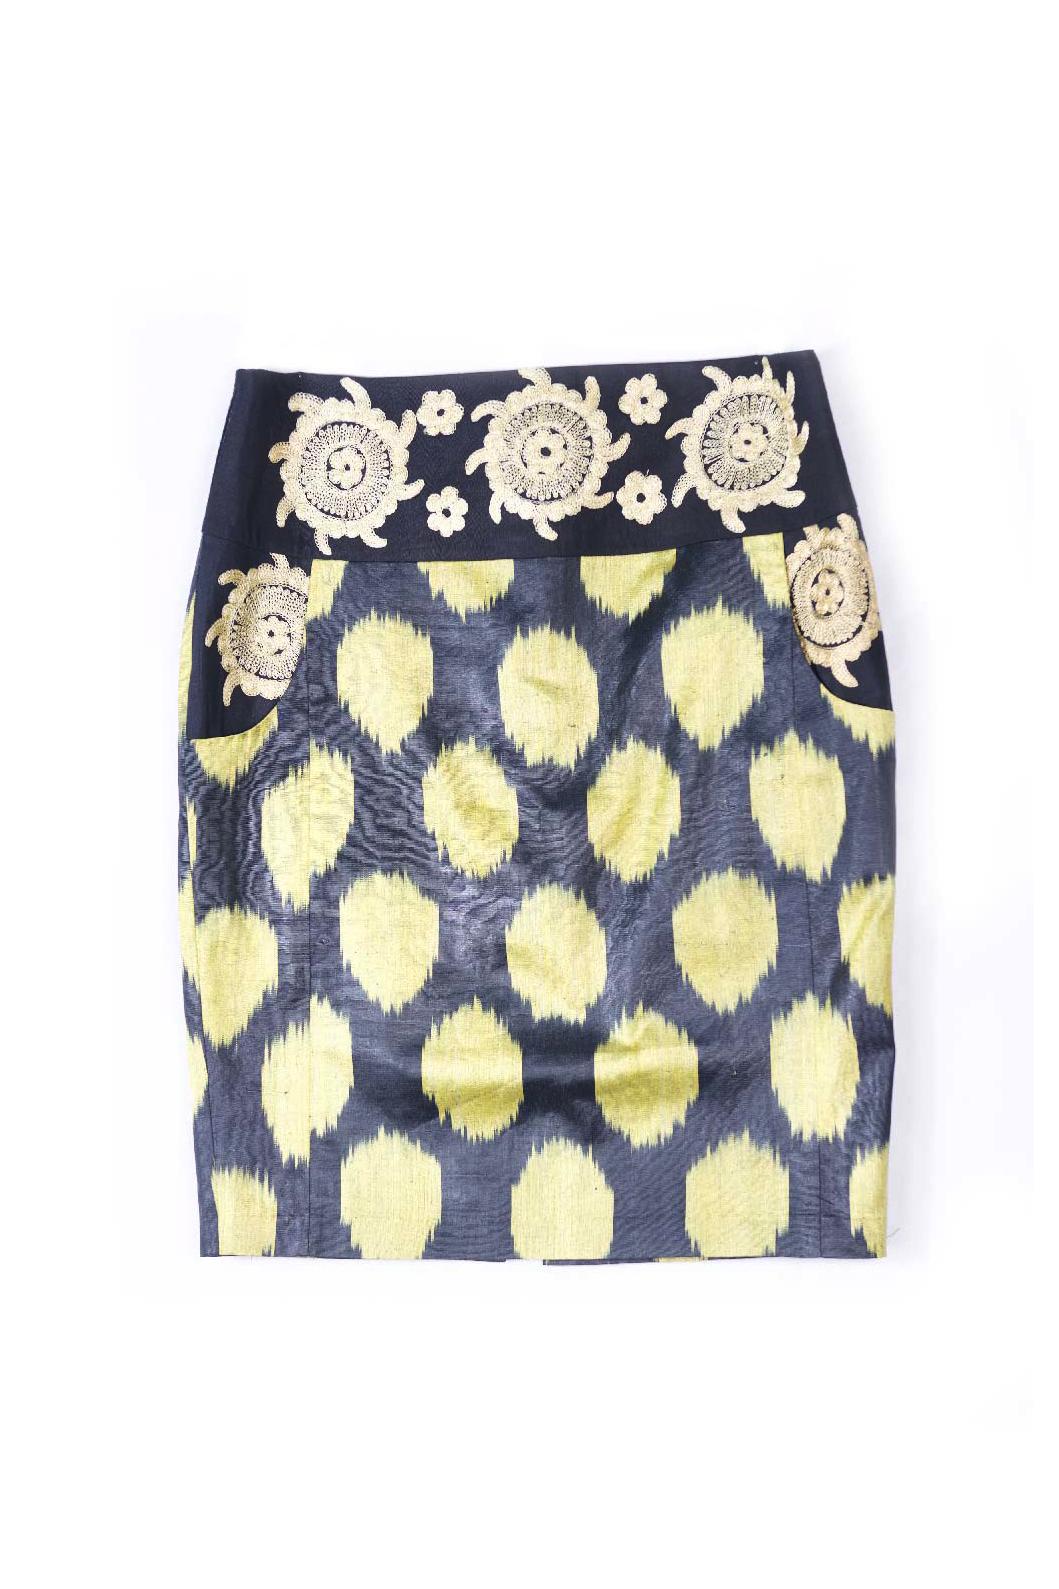 Ikat Embroidered Pencil Skirt IK051